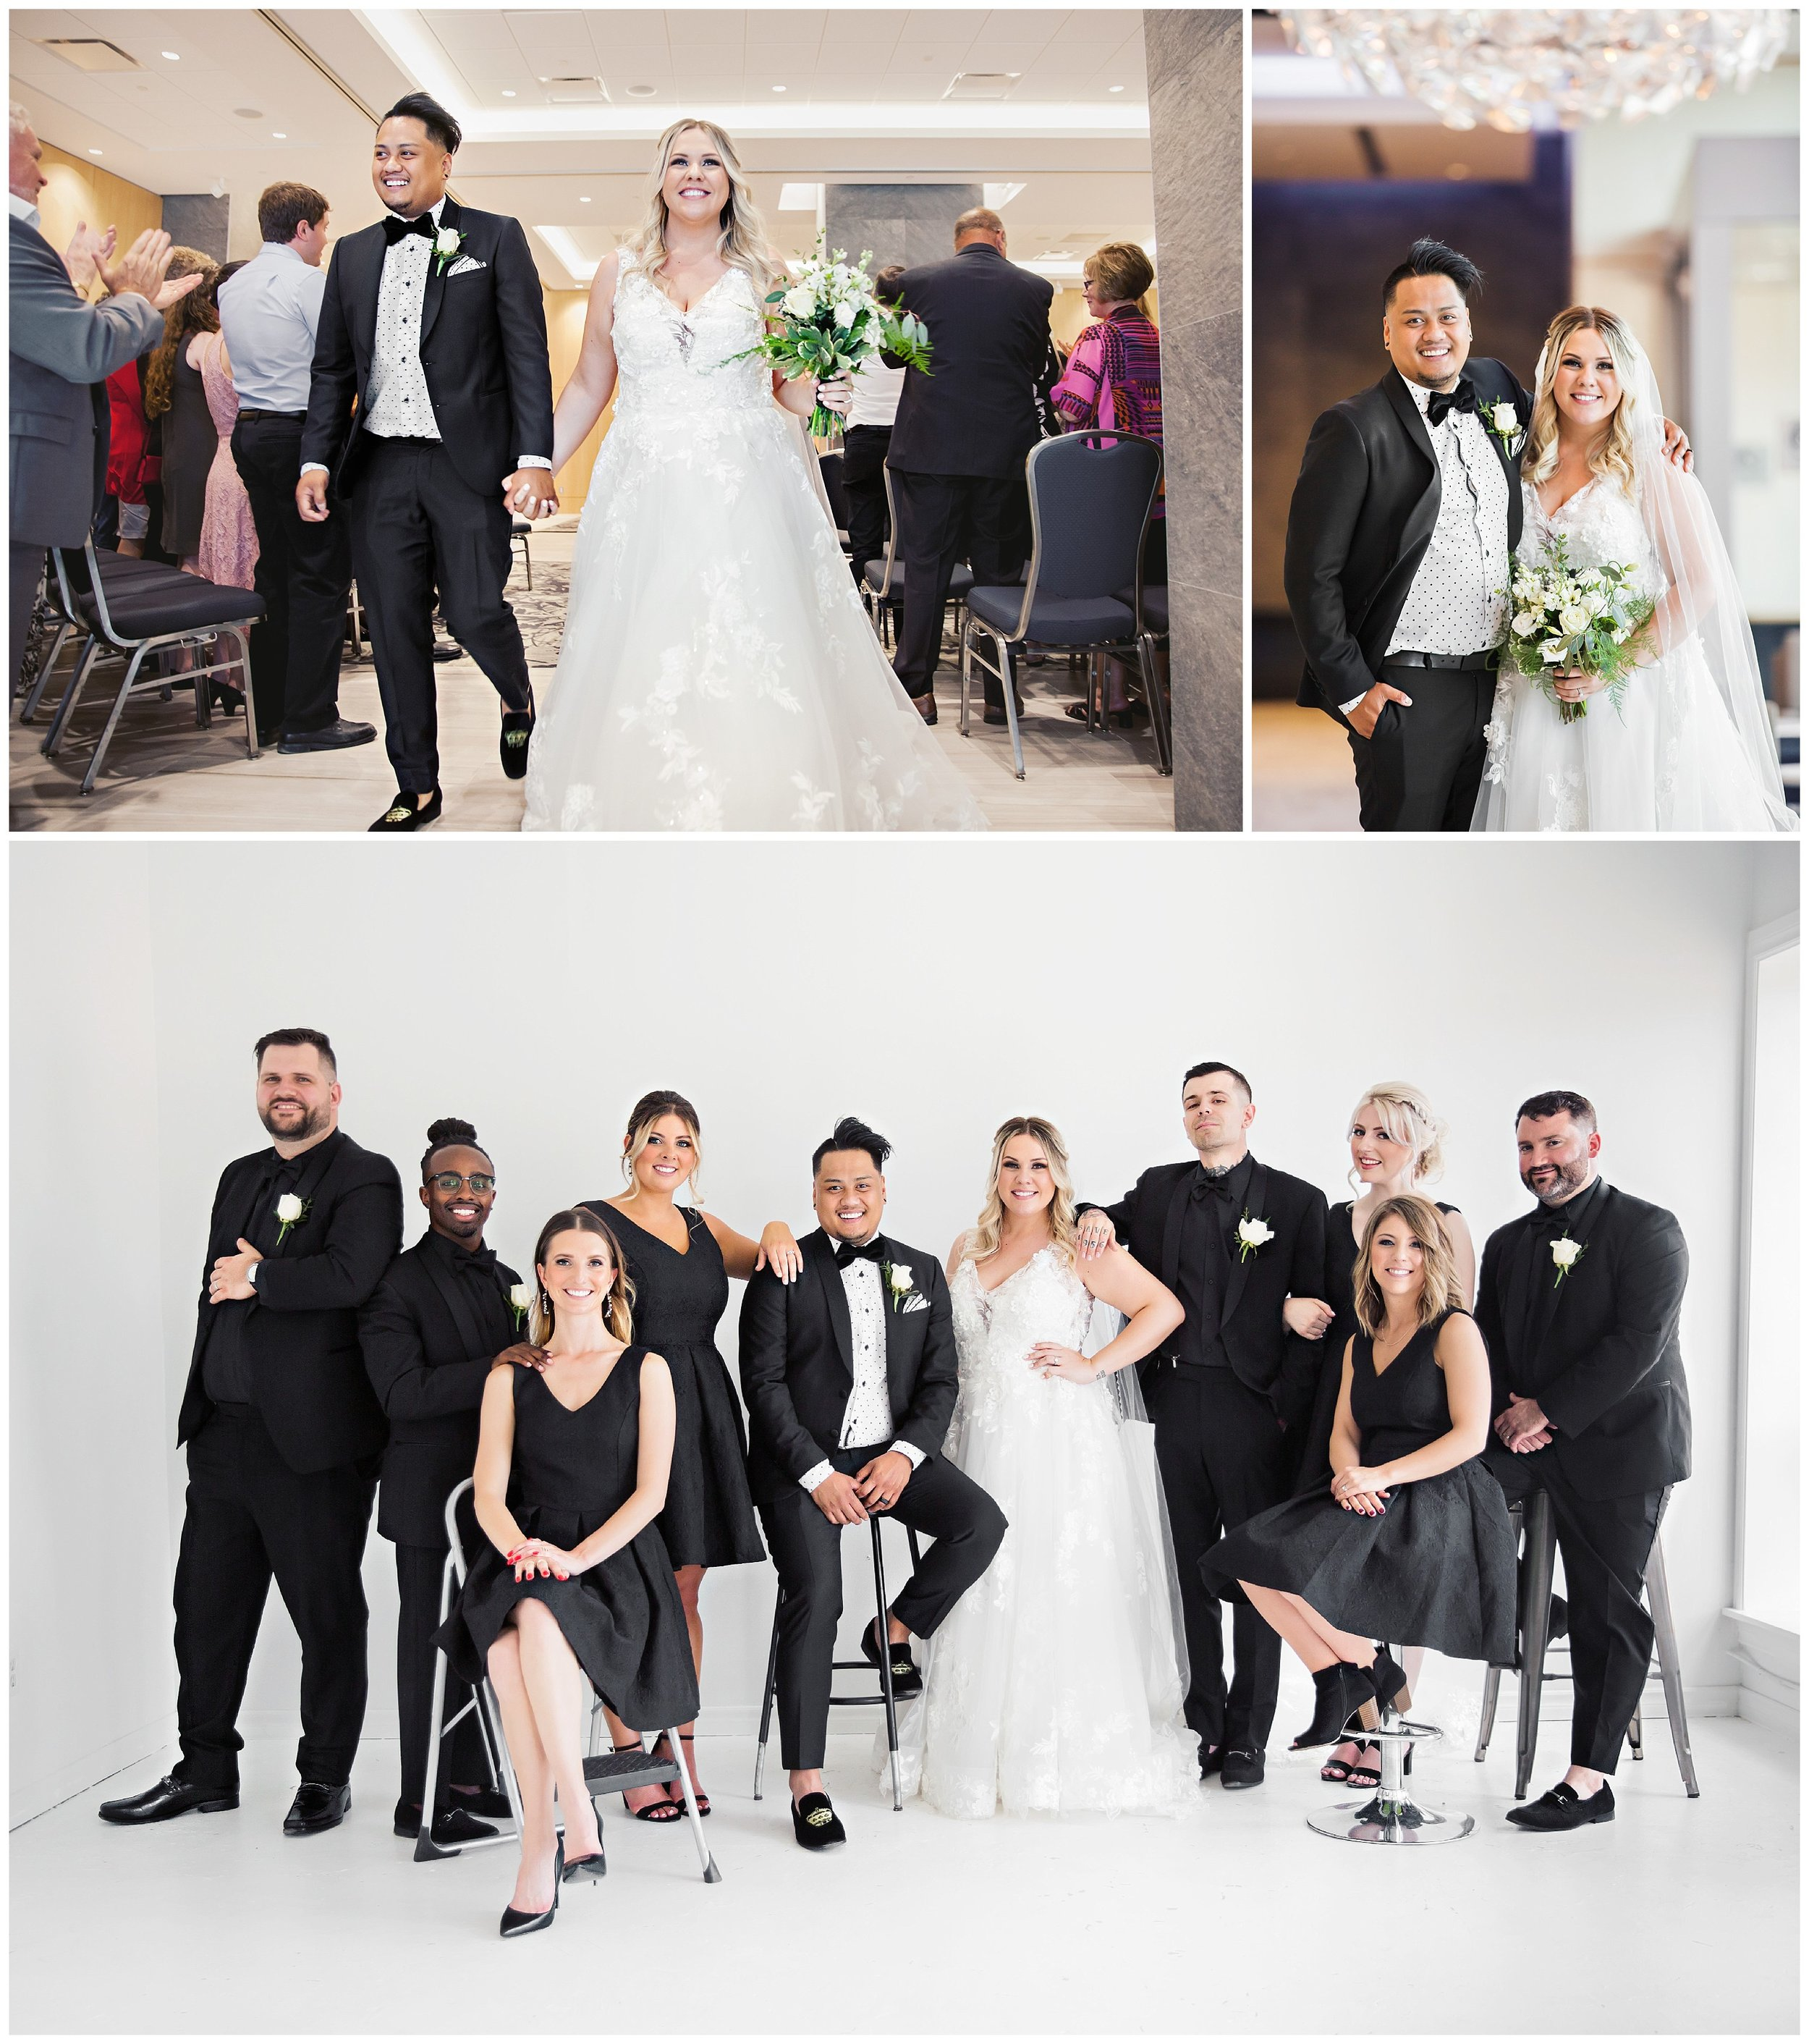 VanDaele-Russell-Wedding-Photography-London-Toronto-Ontario_0102.jpg